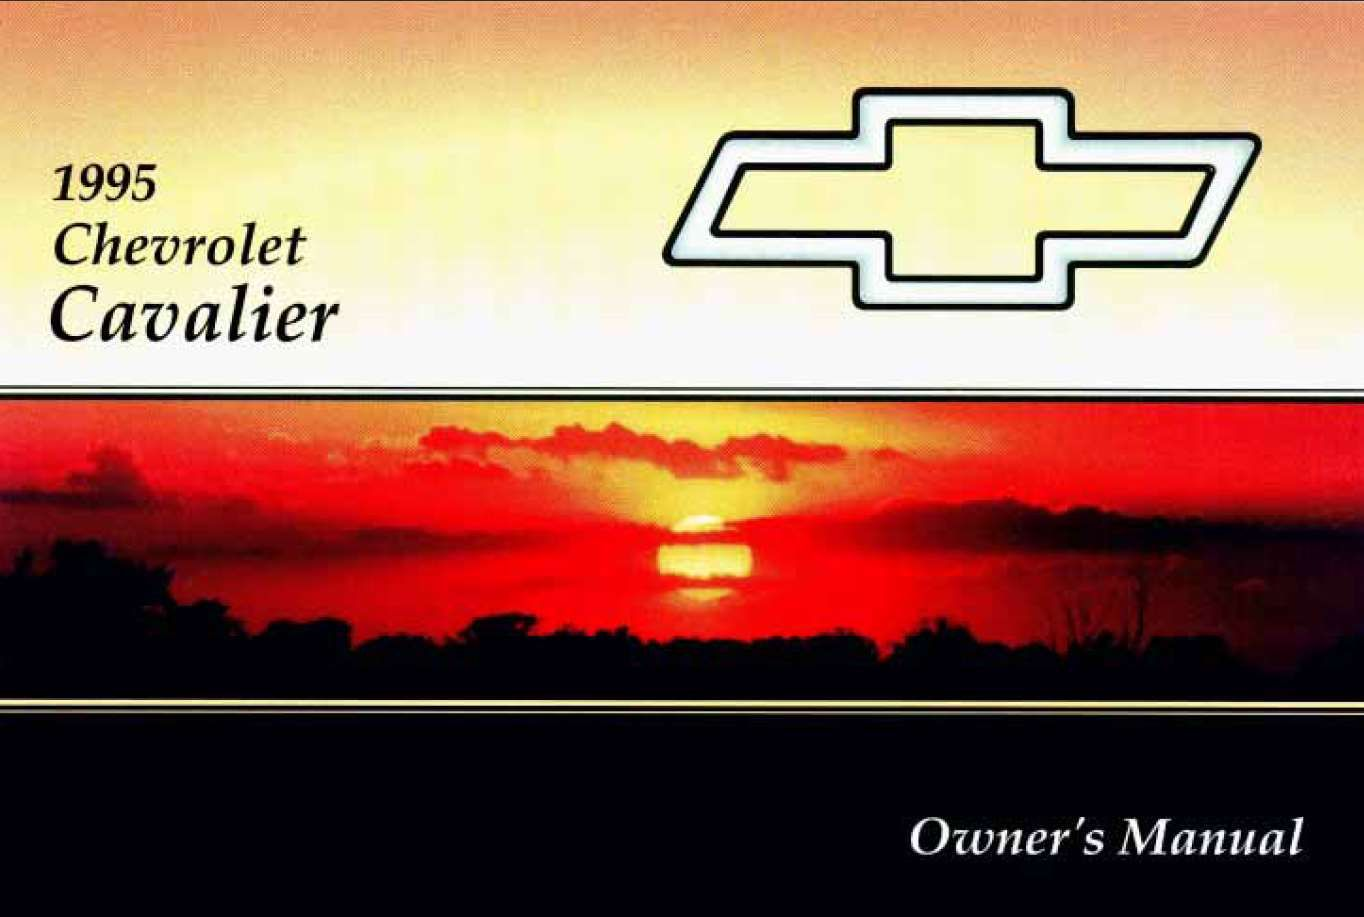 Chevrolet Cavalier 1995 Owner S Manual Has Been Published On Procarmanuals Com Https Procarmanuals Com Chevrolet Chevrolet Cavalier Owners Manuals Chevrolet